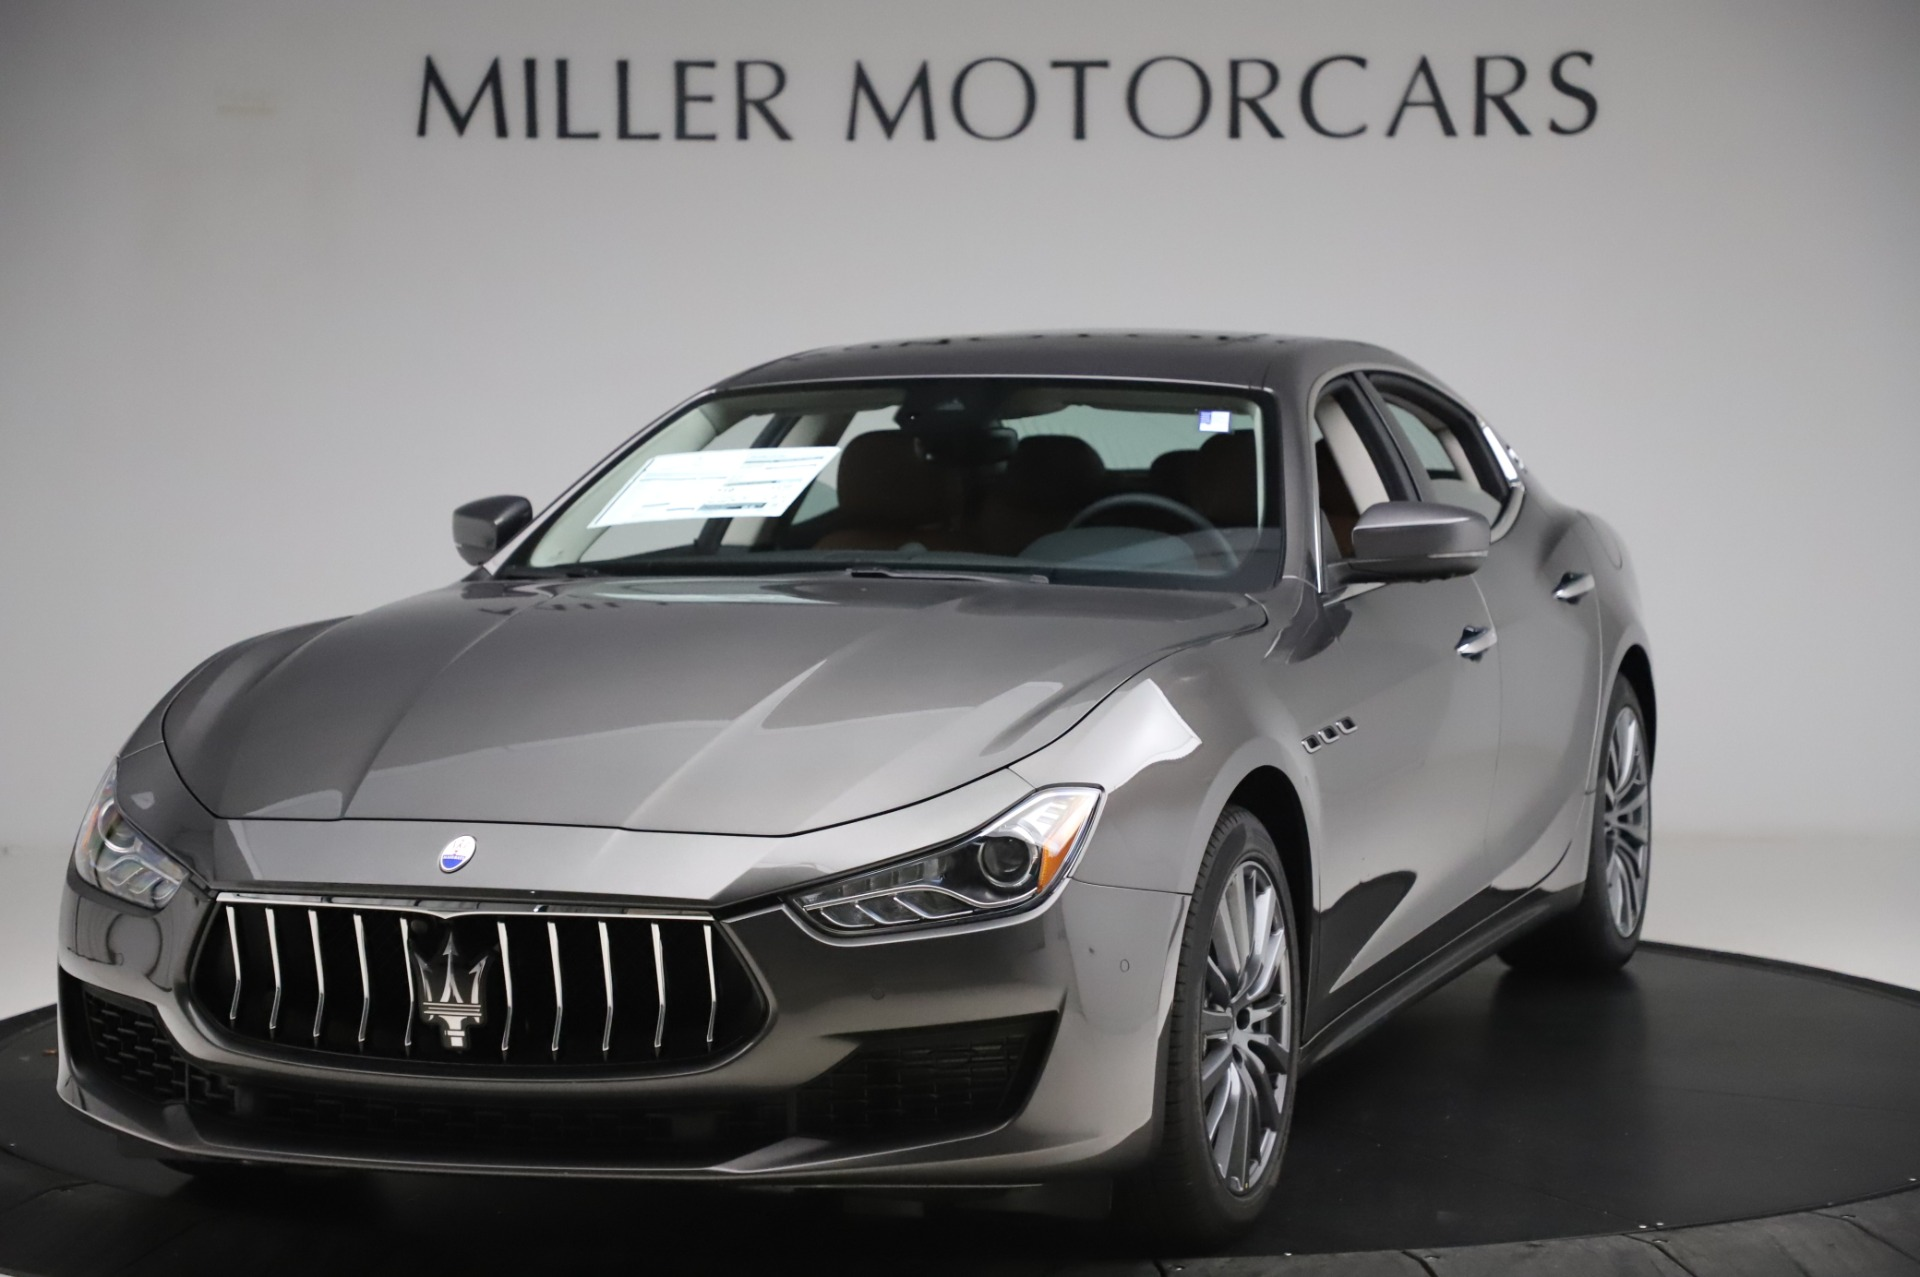 New 2020 Maserati Ghibli S Q4 for sale $83,785 at Maserati of Greenwich in Greenwich CT 06830 1